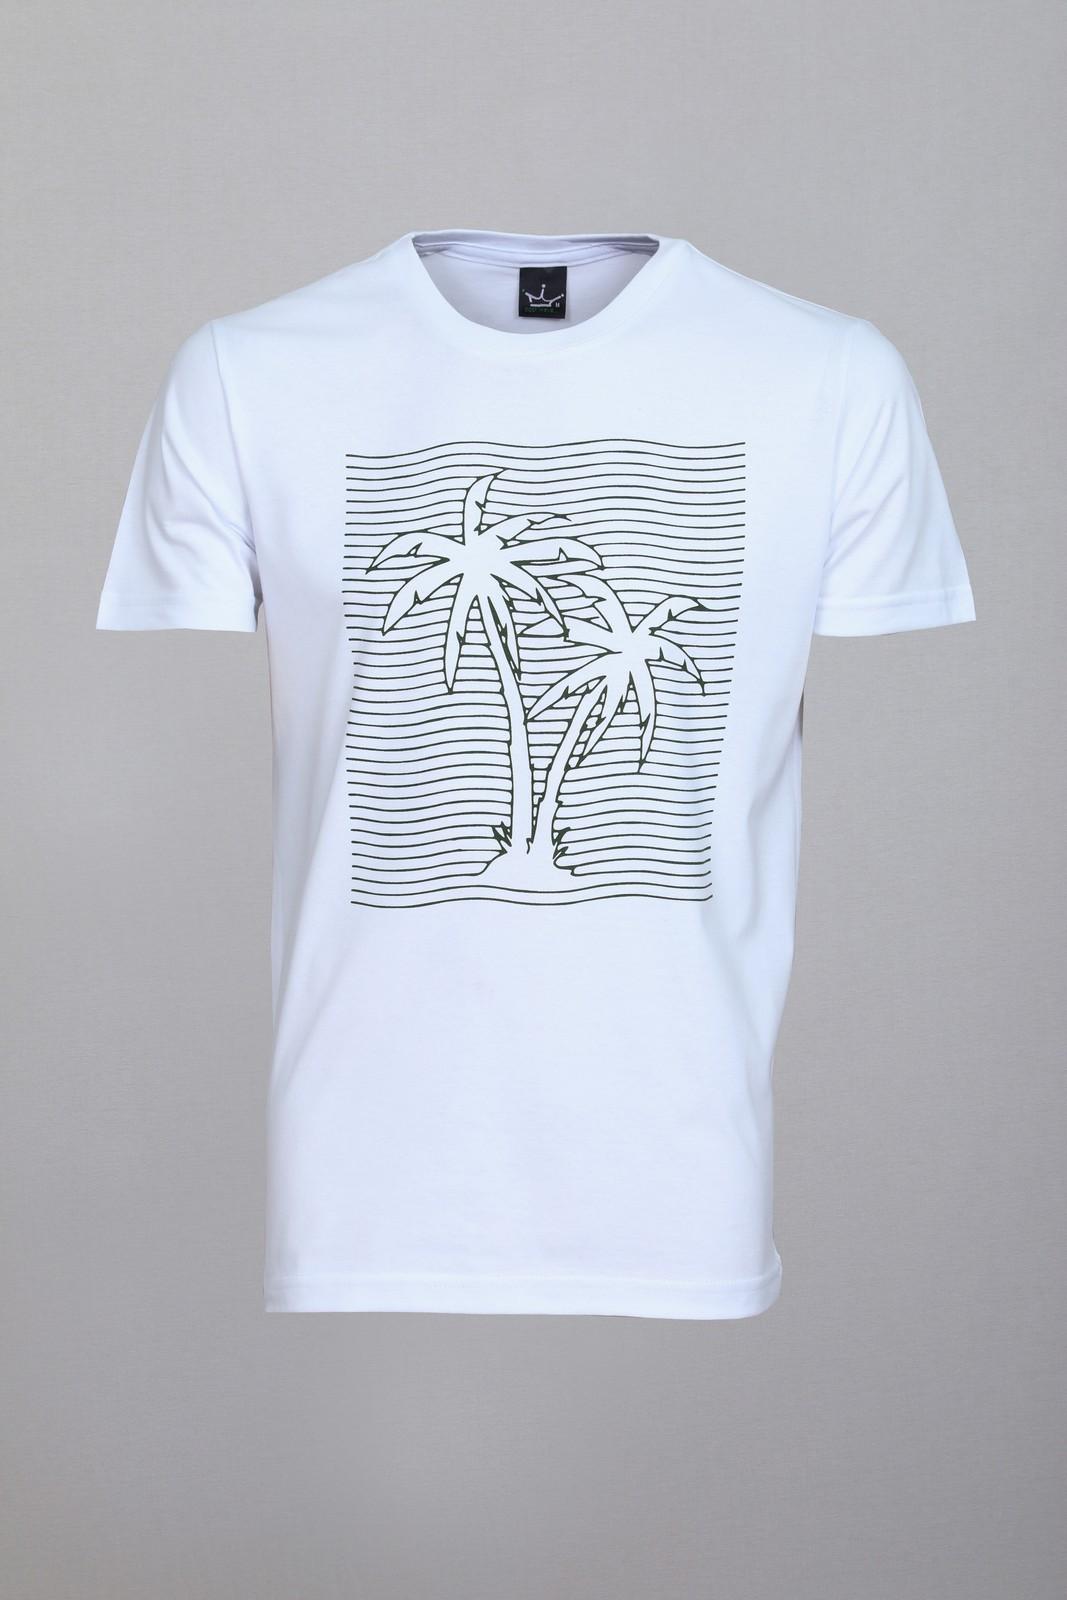 Camiseta CoolWave Coqueiro